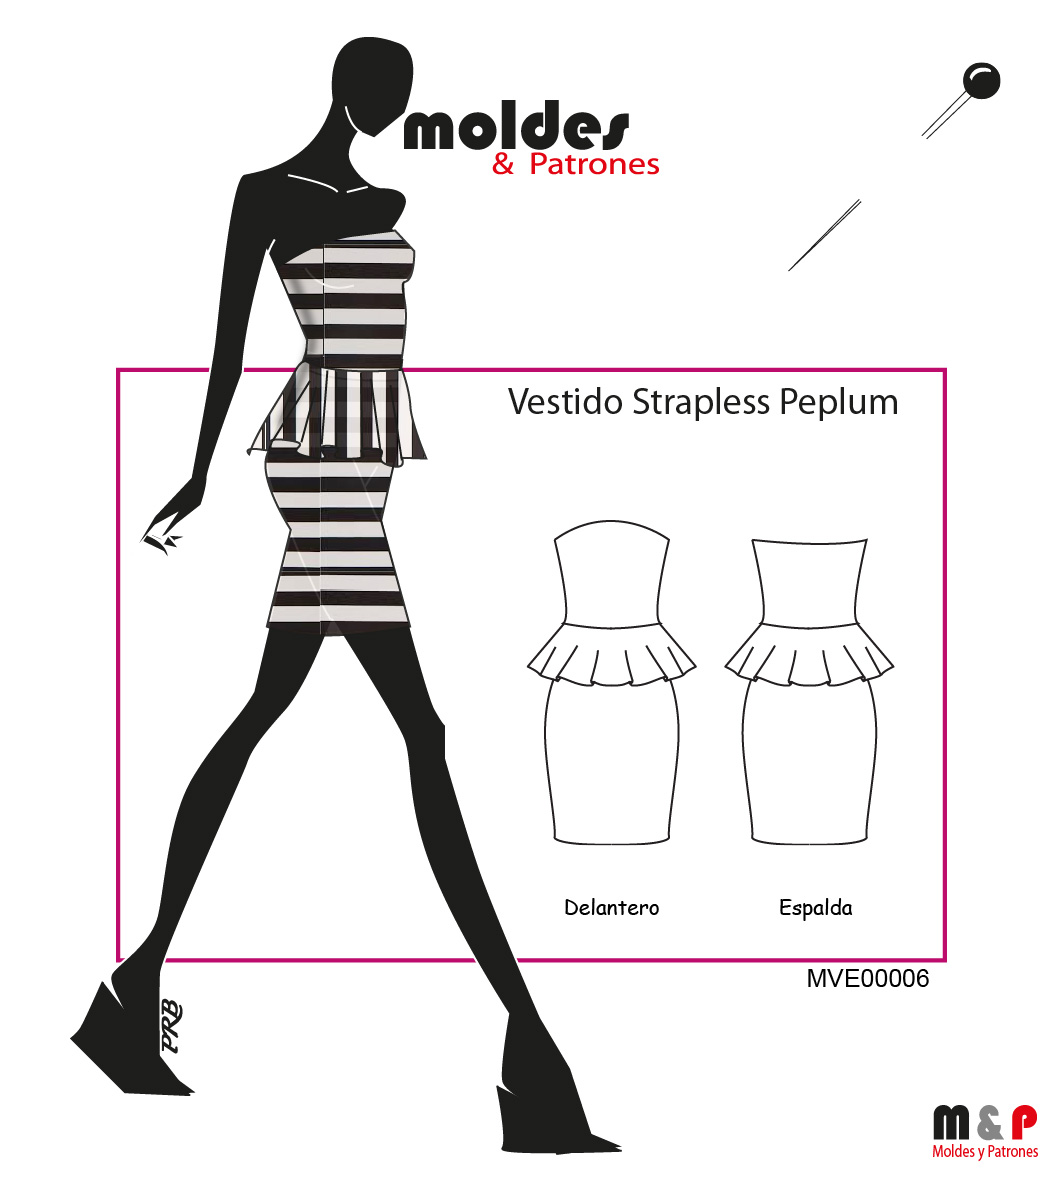 3 TALLAS S M L - Vestido Strapless Peplum